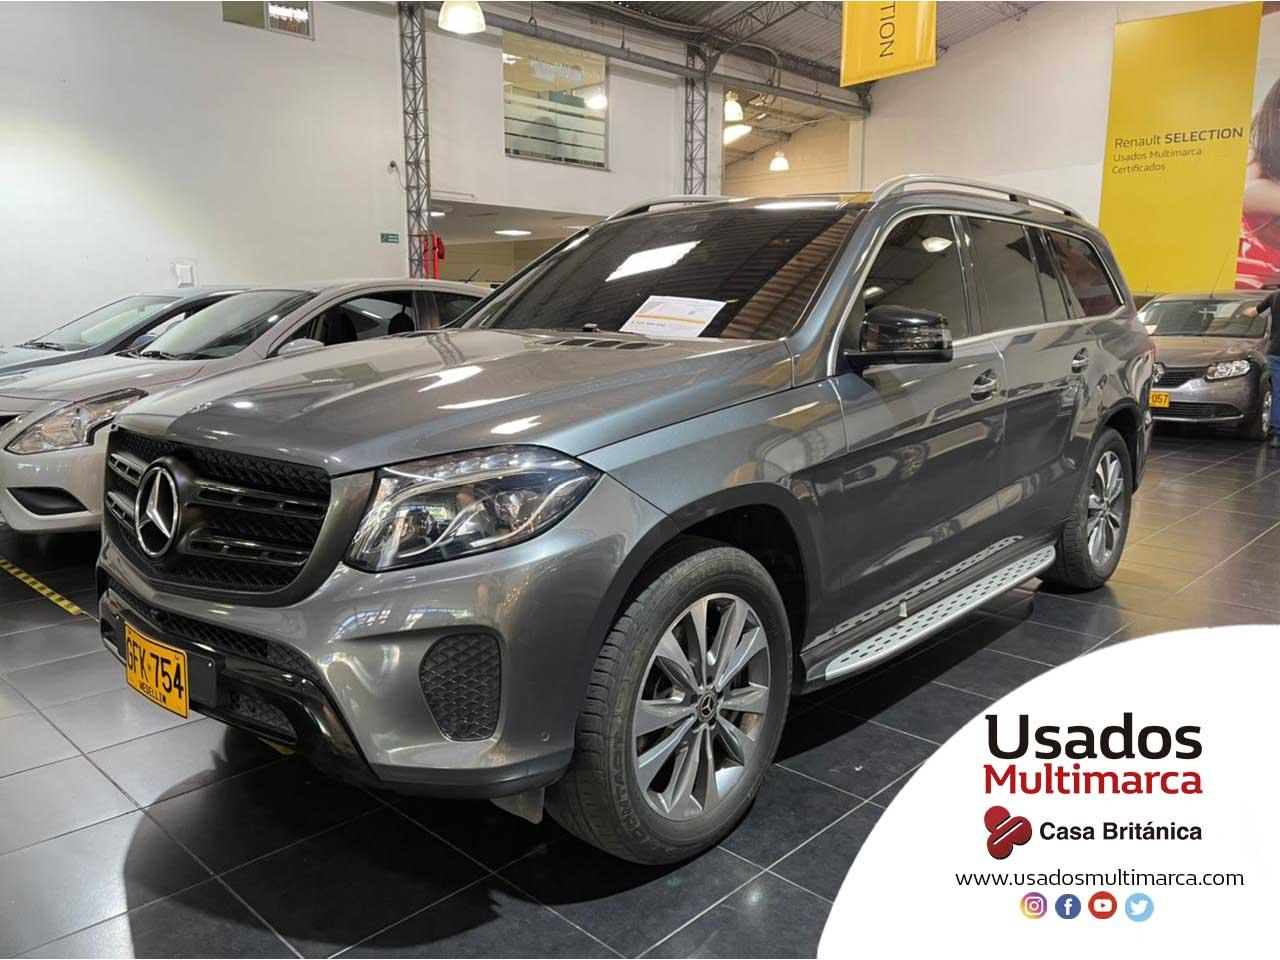 Mercedez-Benz-Gls-500-01408812-1